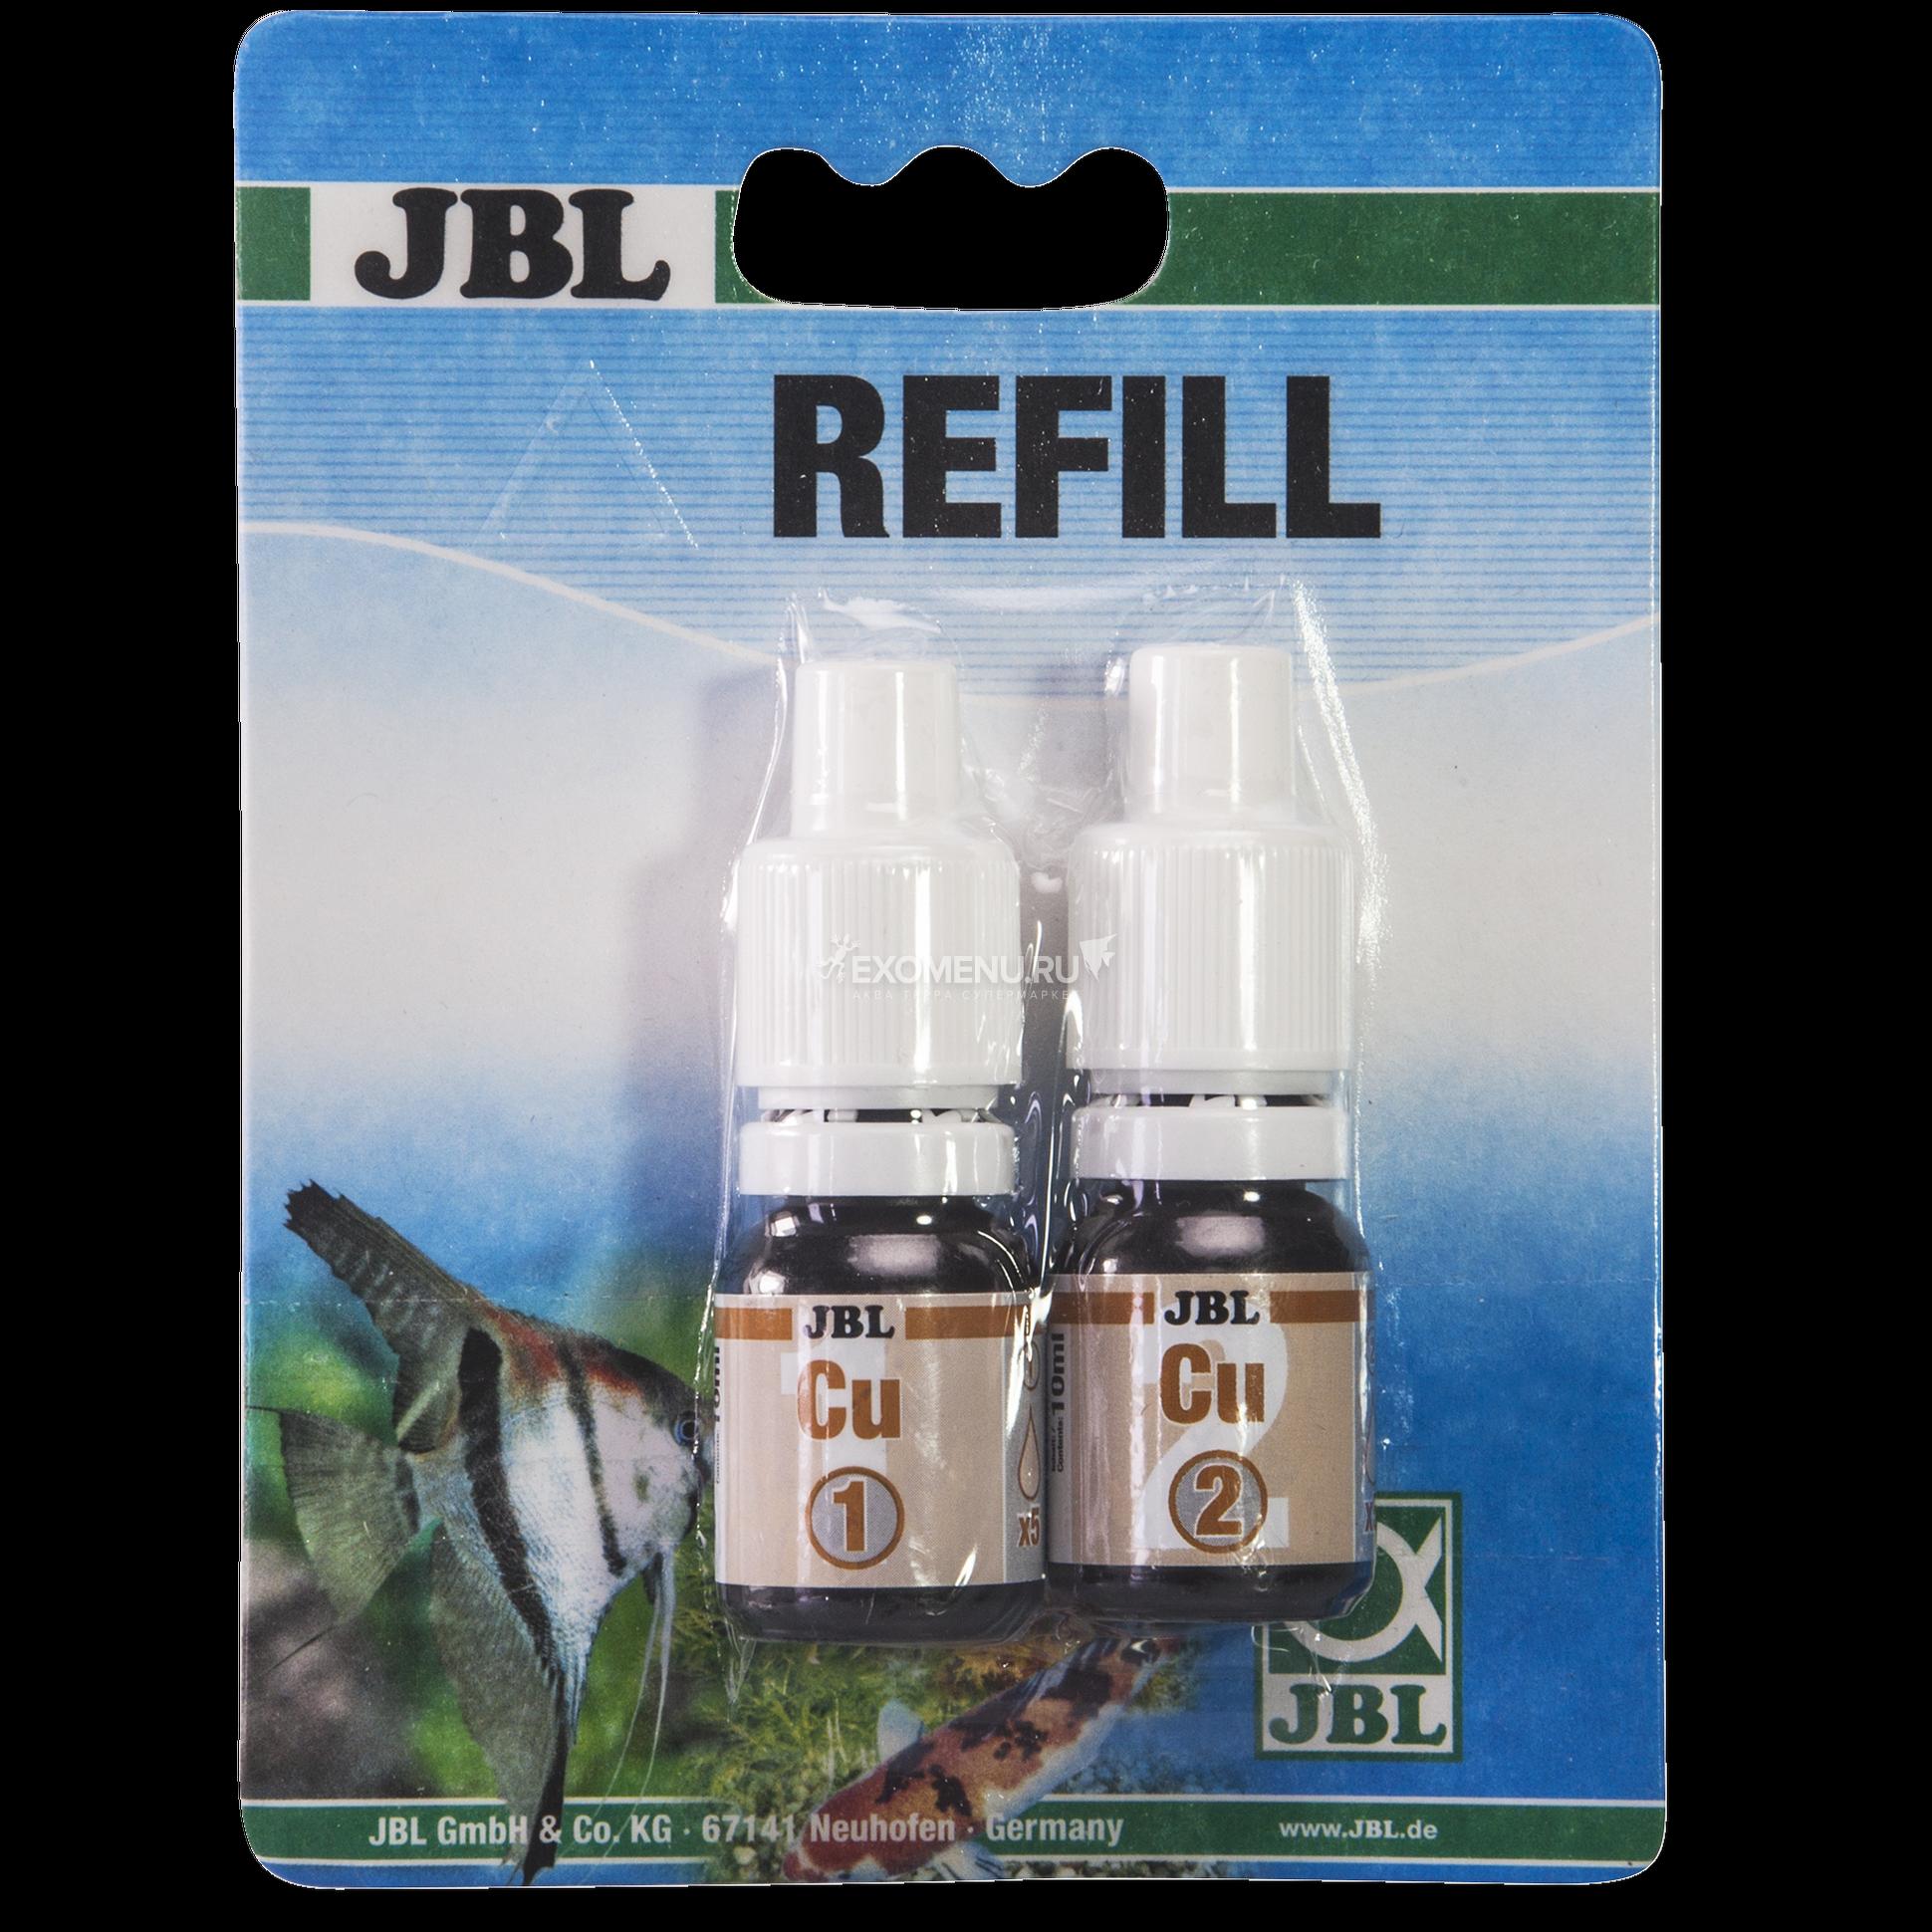 JBL ProAquaTest Cu Copper Refill - Дополнительные реагенты для экспресс-теста JBL ProAquaTest Cu Copper